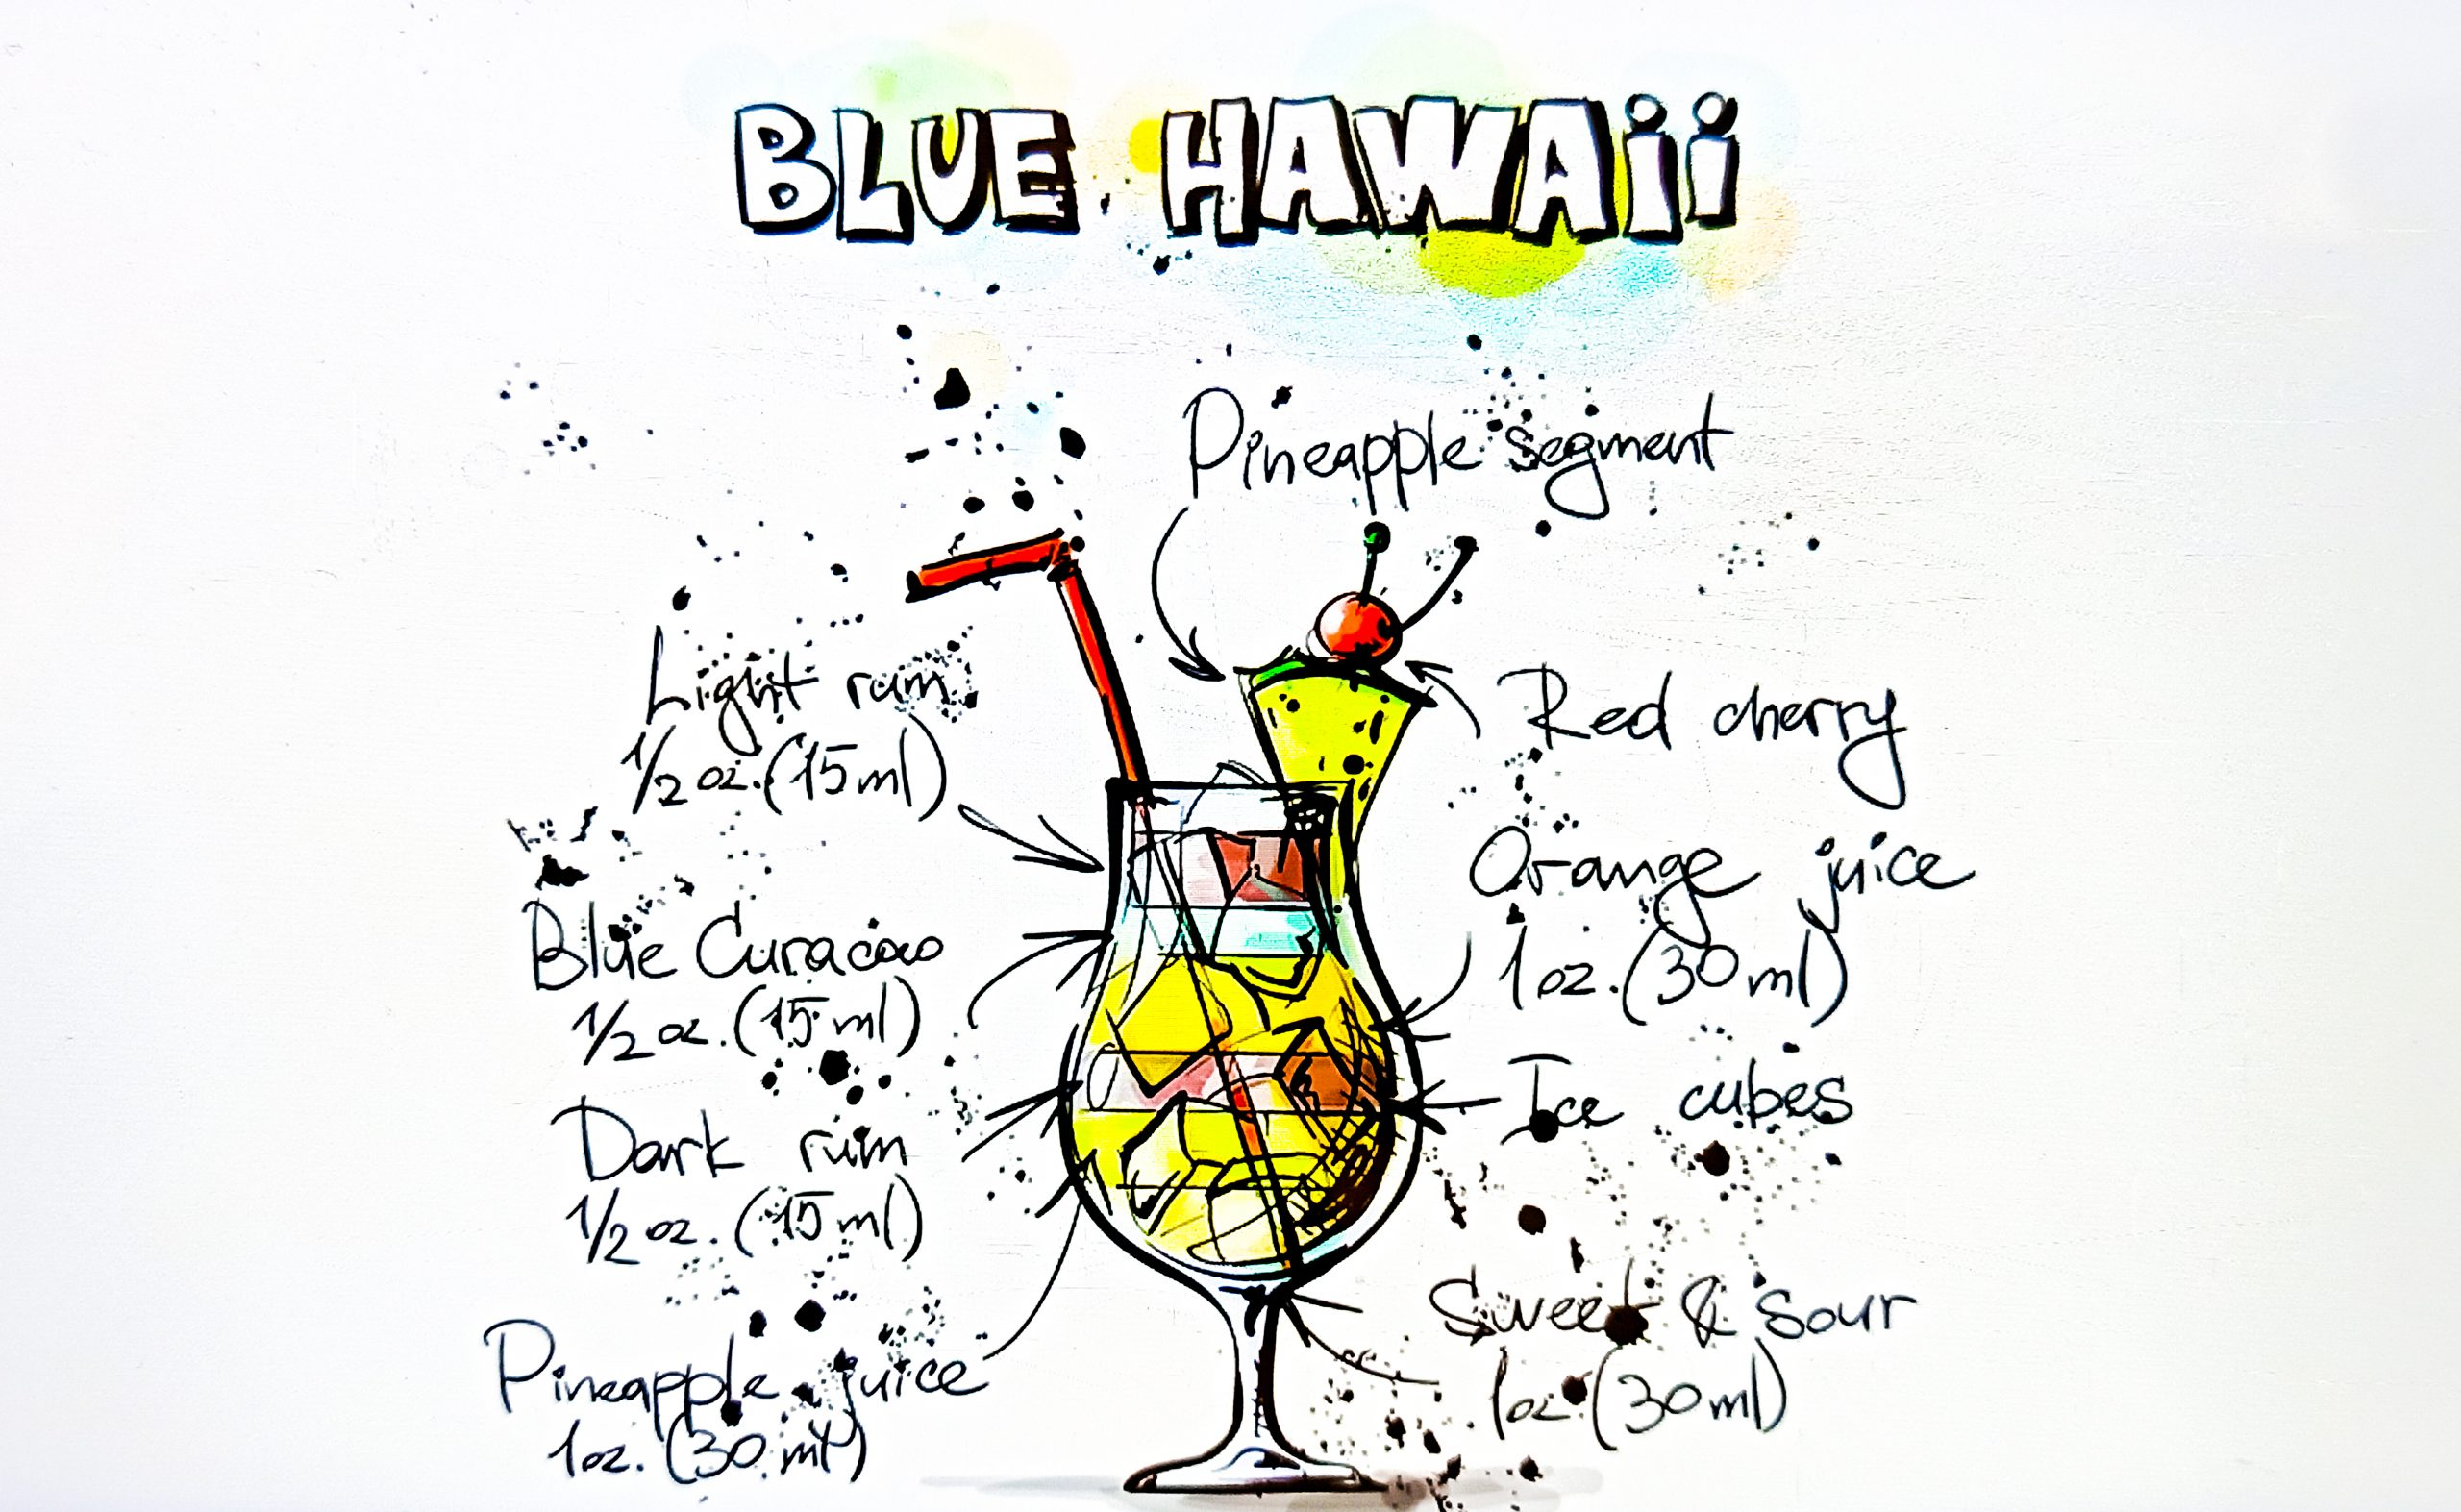 Cocktail drink Blue Hawaii Illustration